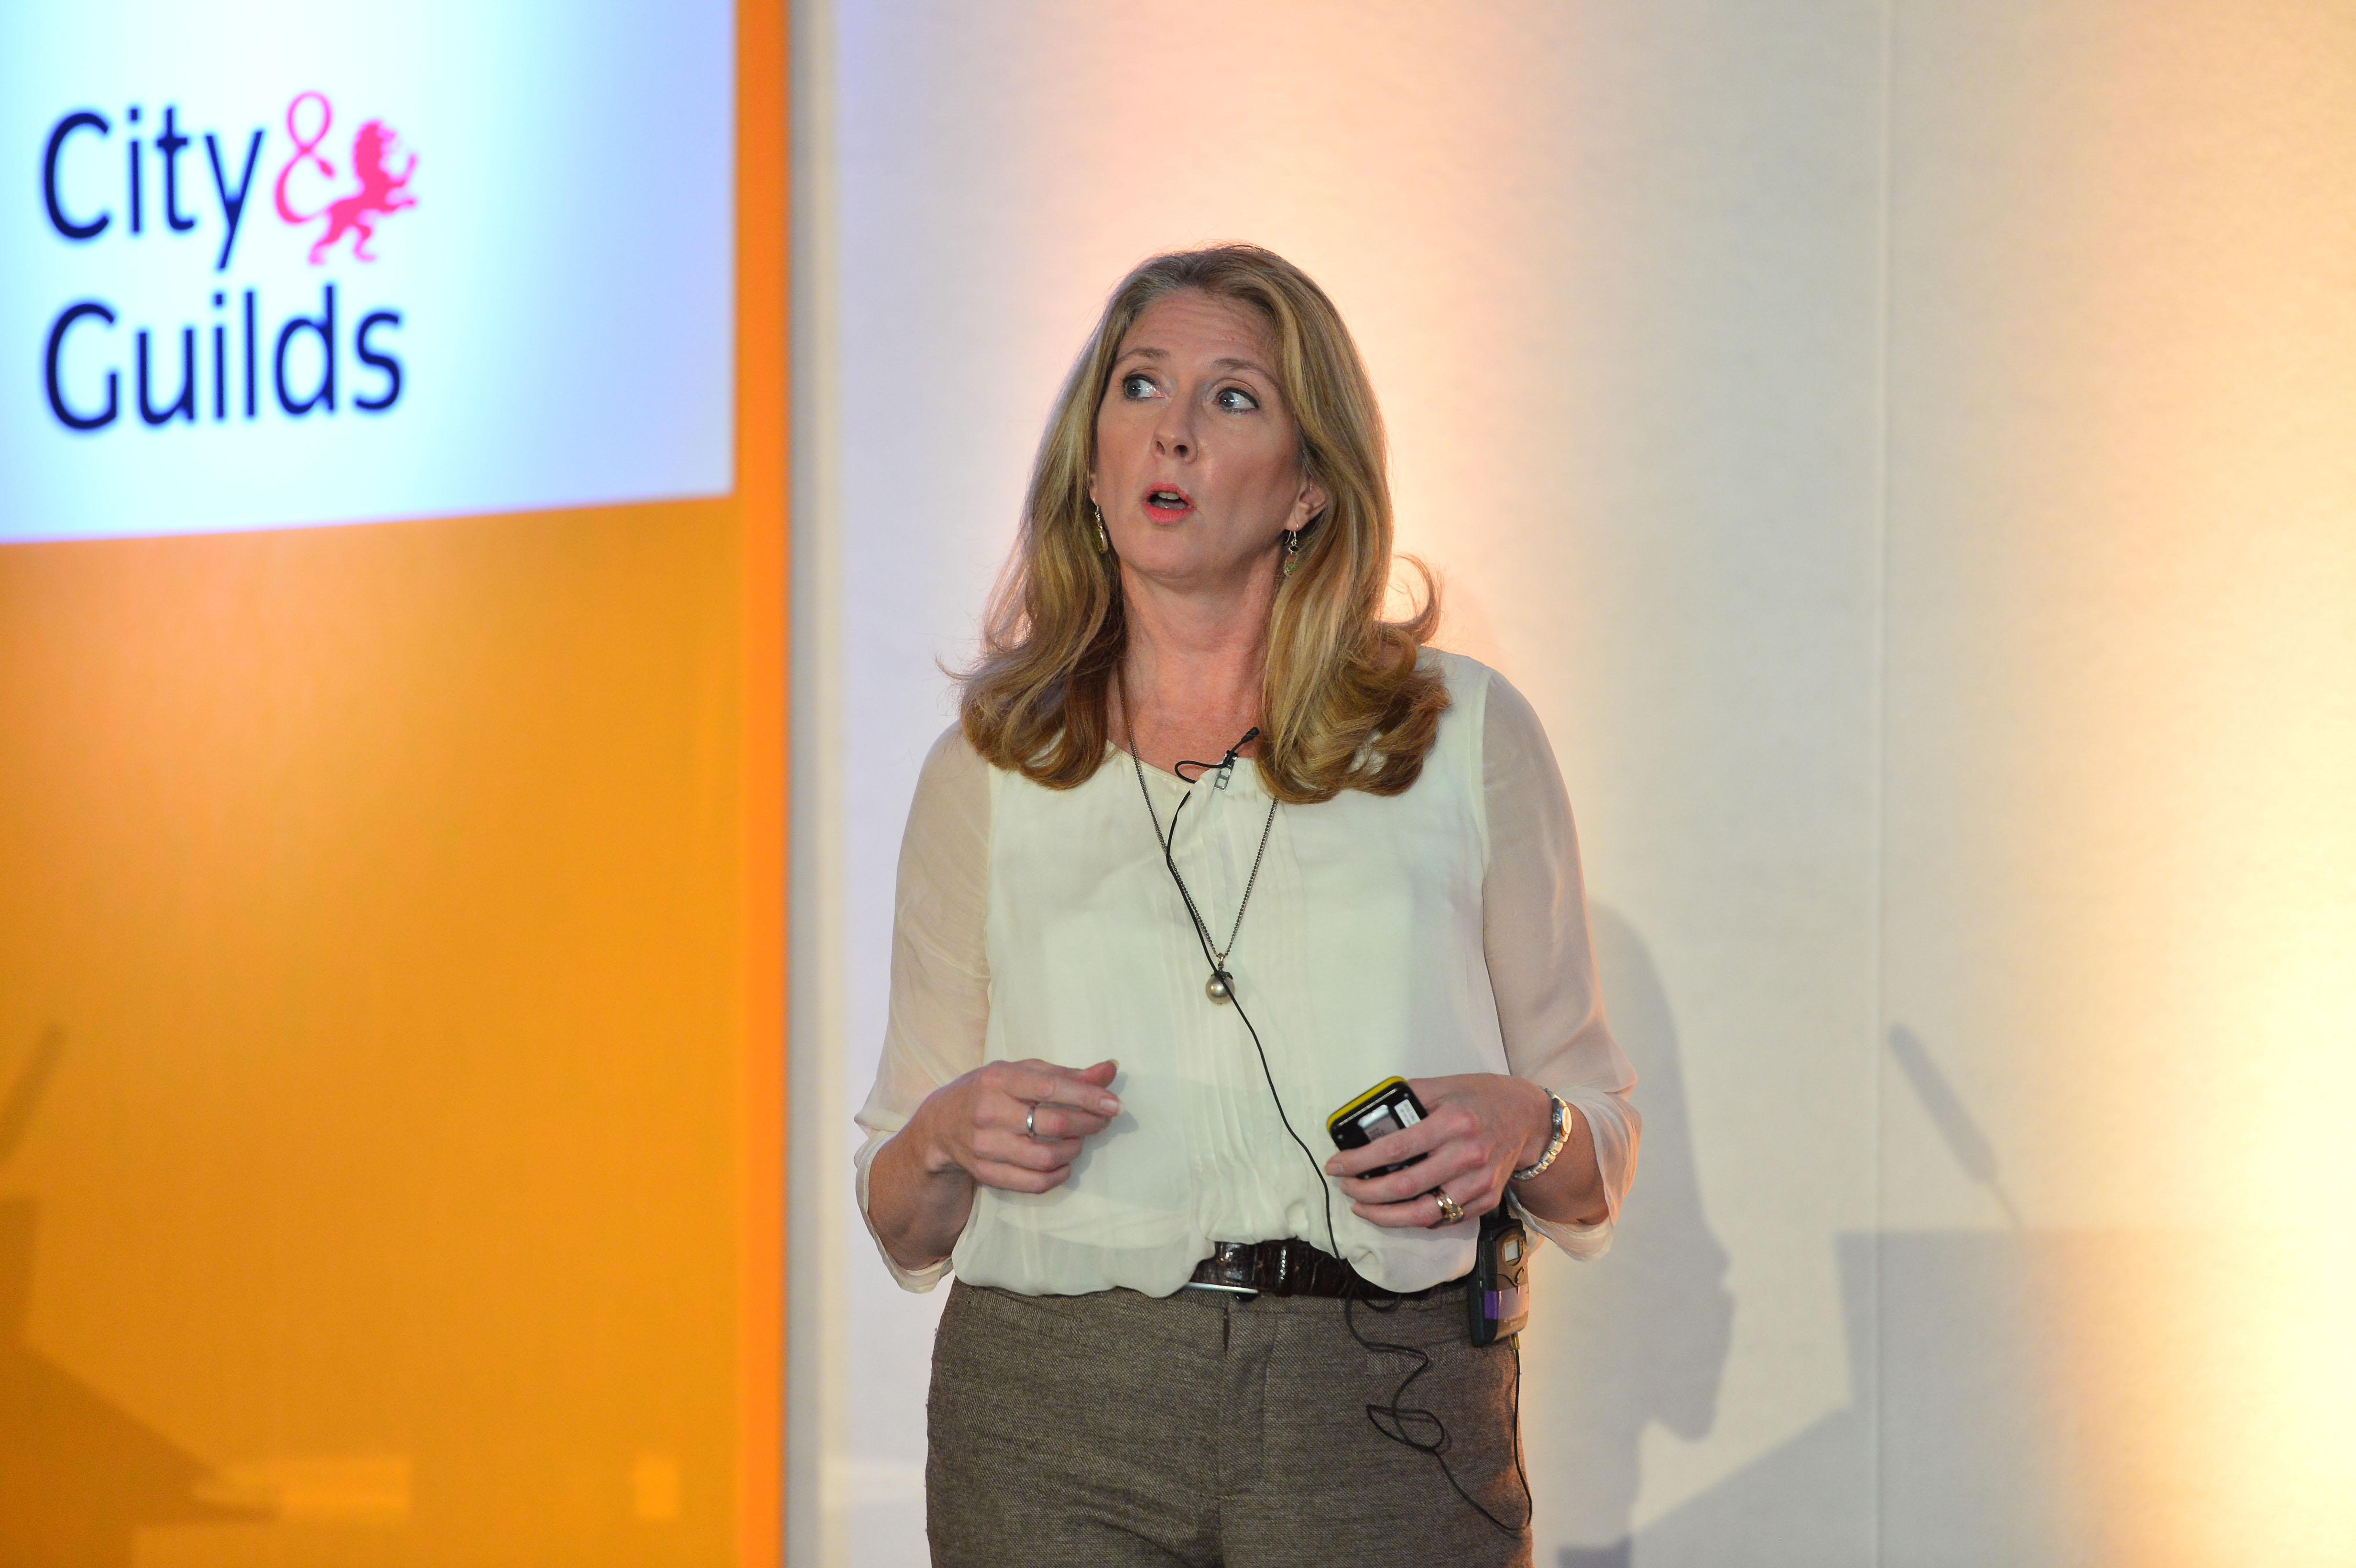 Sharon Walpole, Walpole Media Group Ltd chief executive